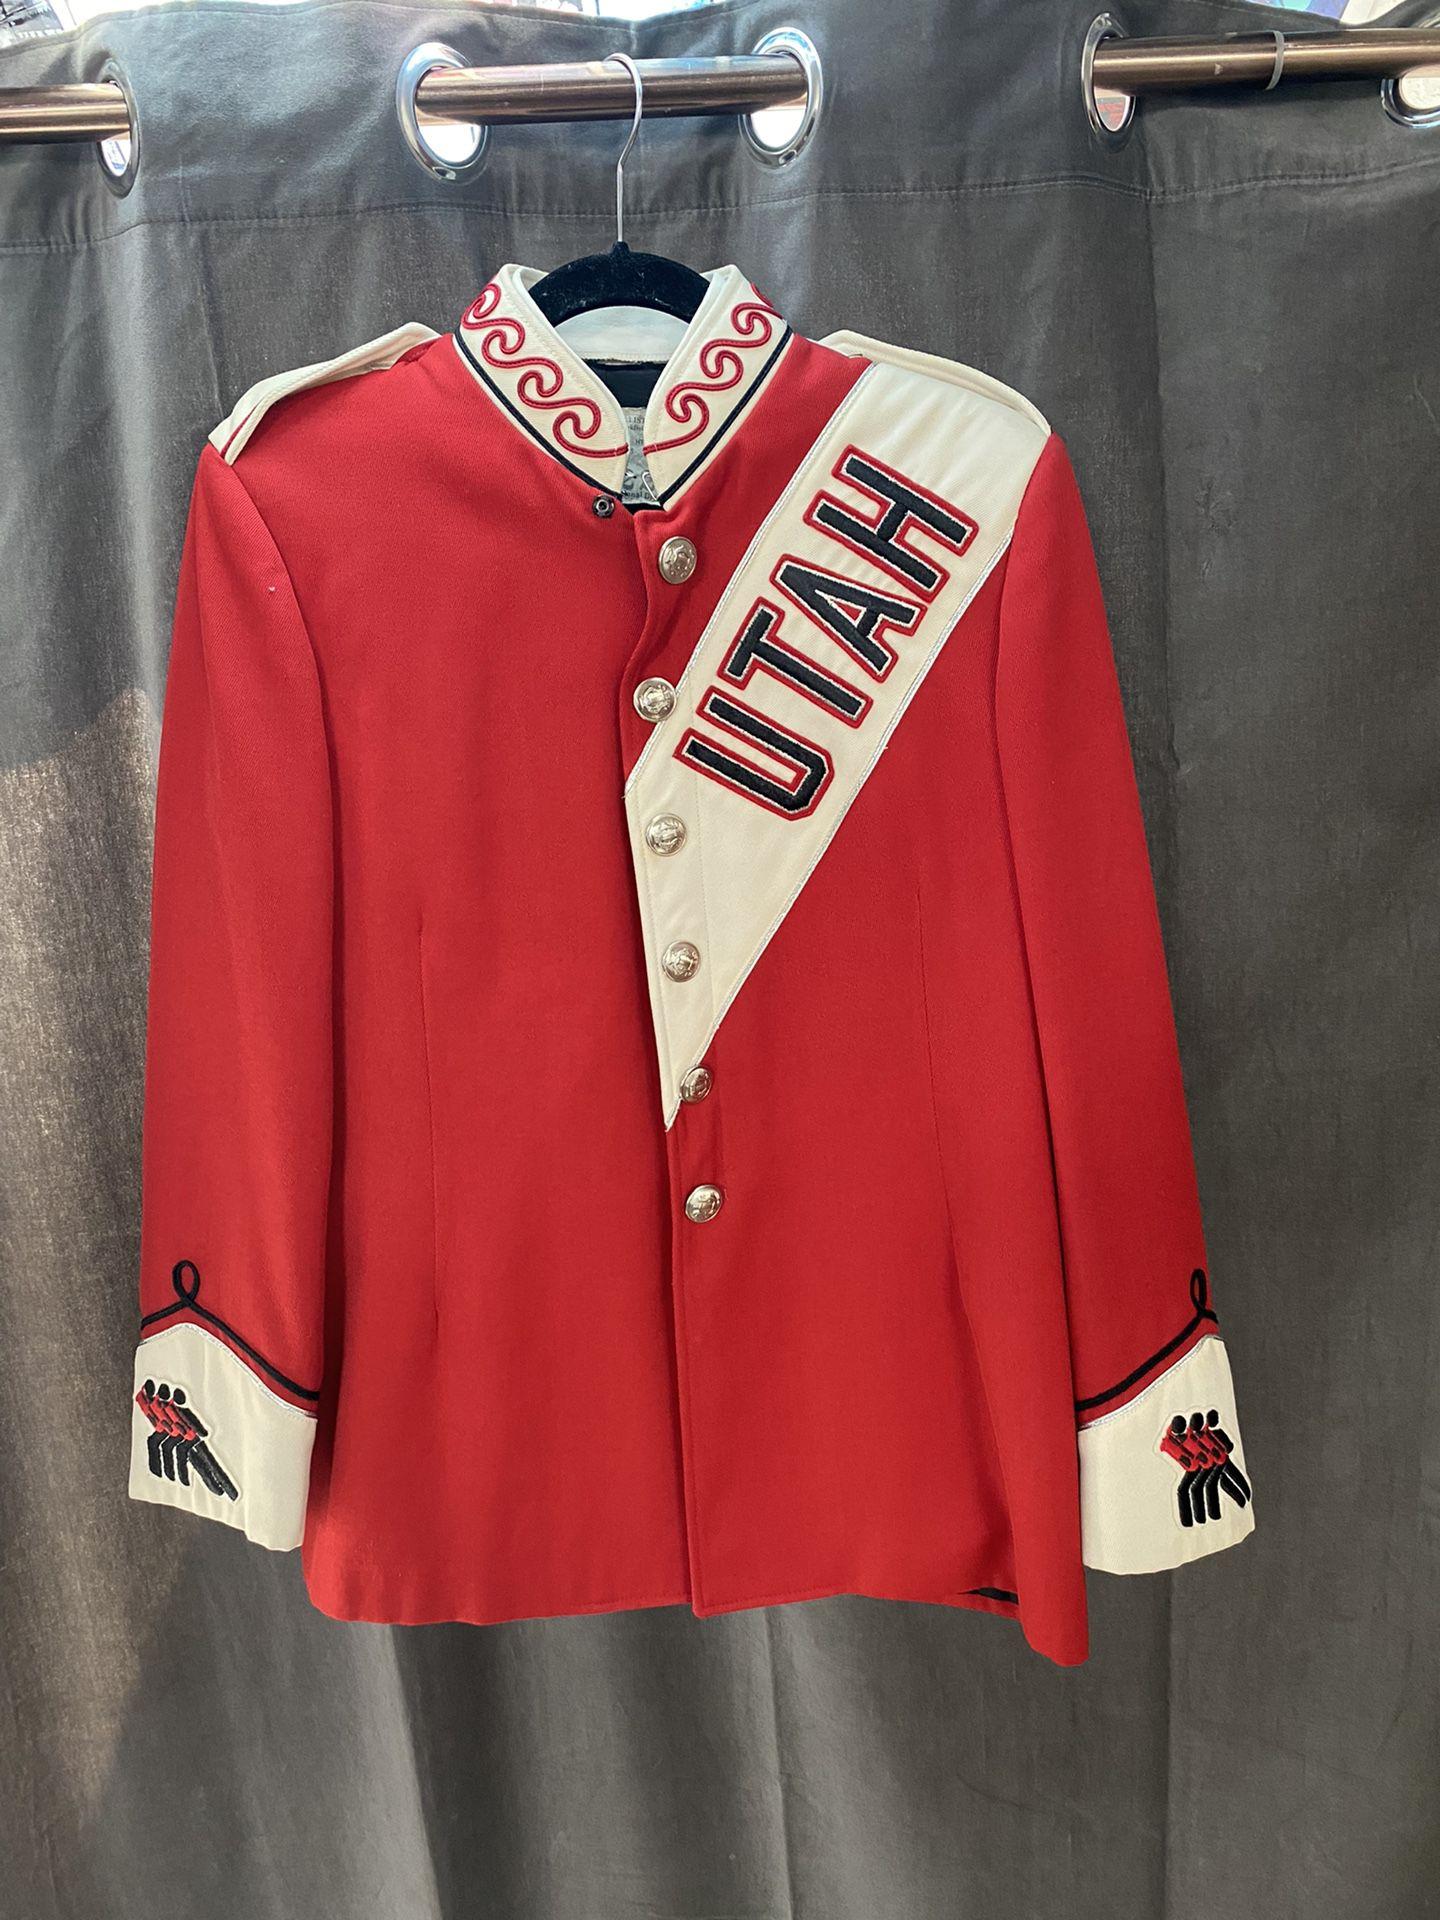 Utah Utes Marching band Uniform